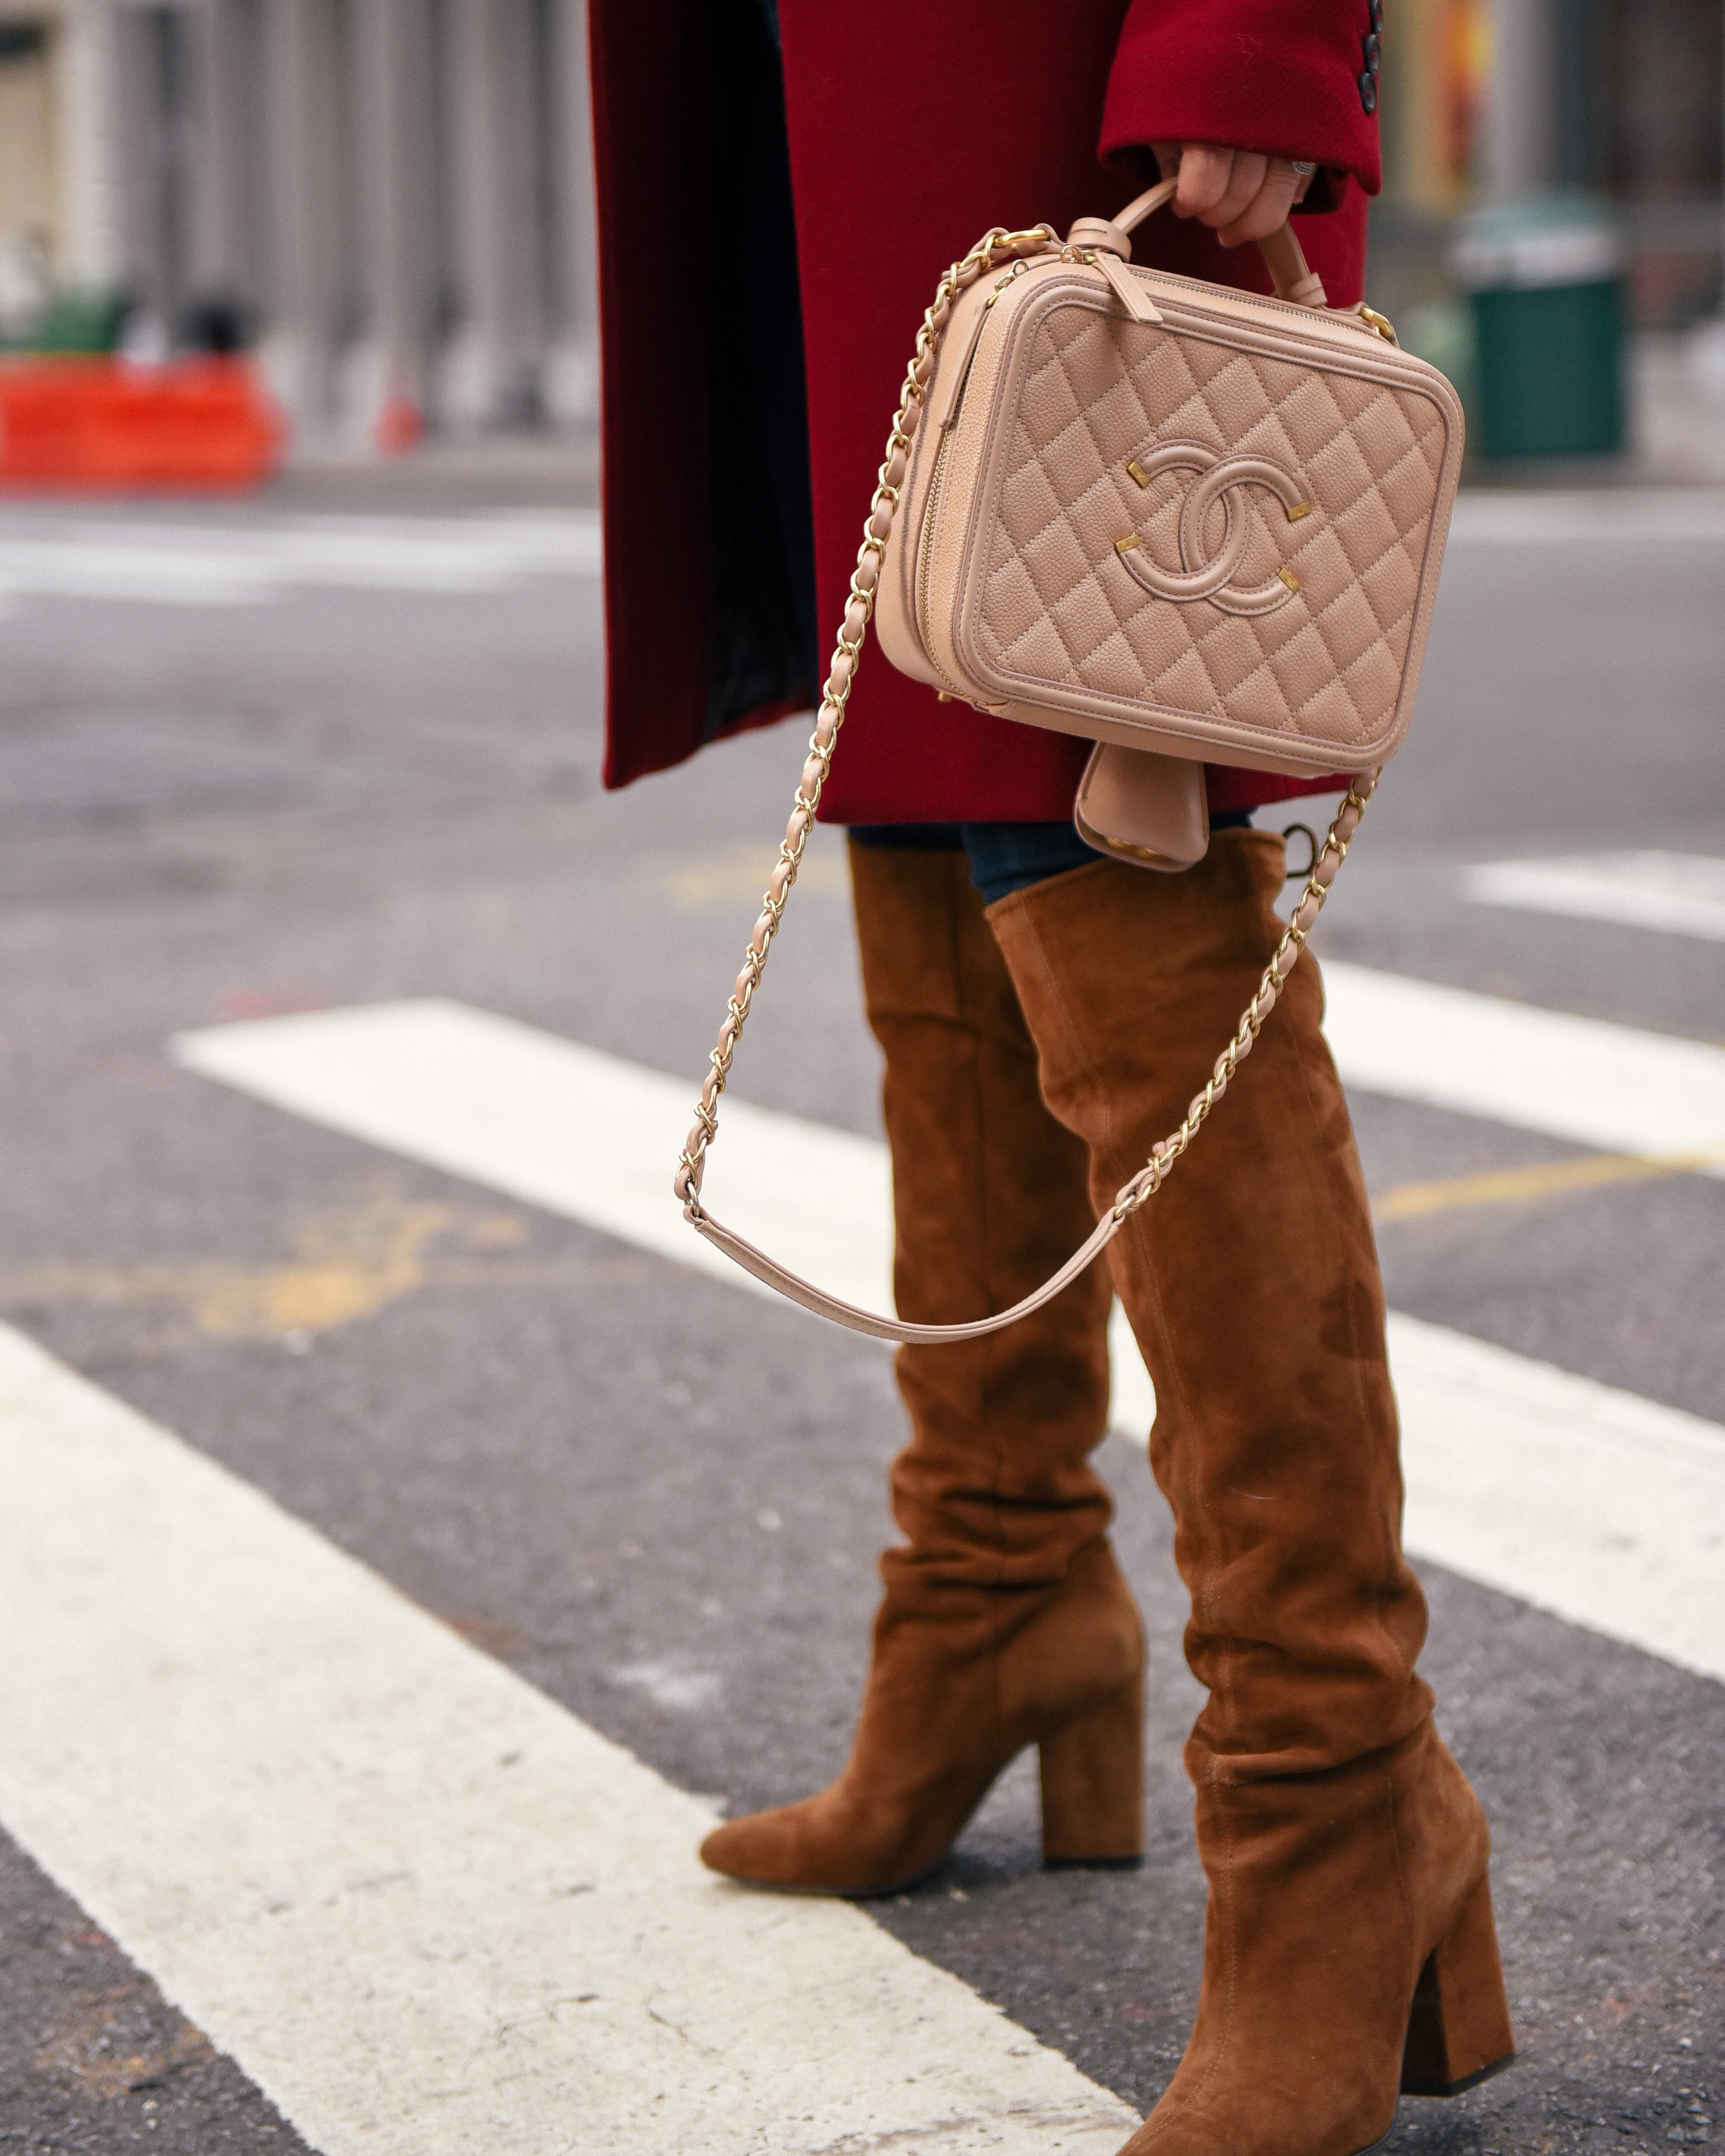 eBay-Coats-Jacket-Red-Coat-New-York-Chanel-Handbag-Winter-Outfit-Lo-Murphy